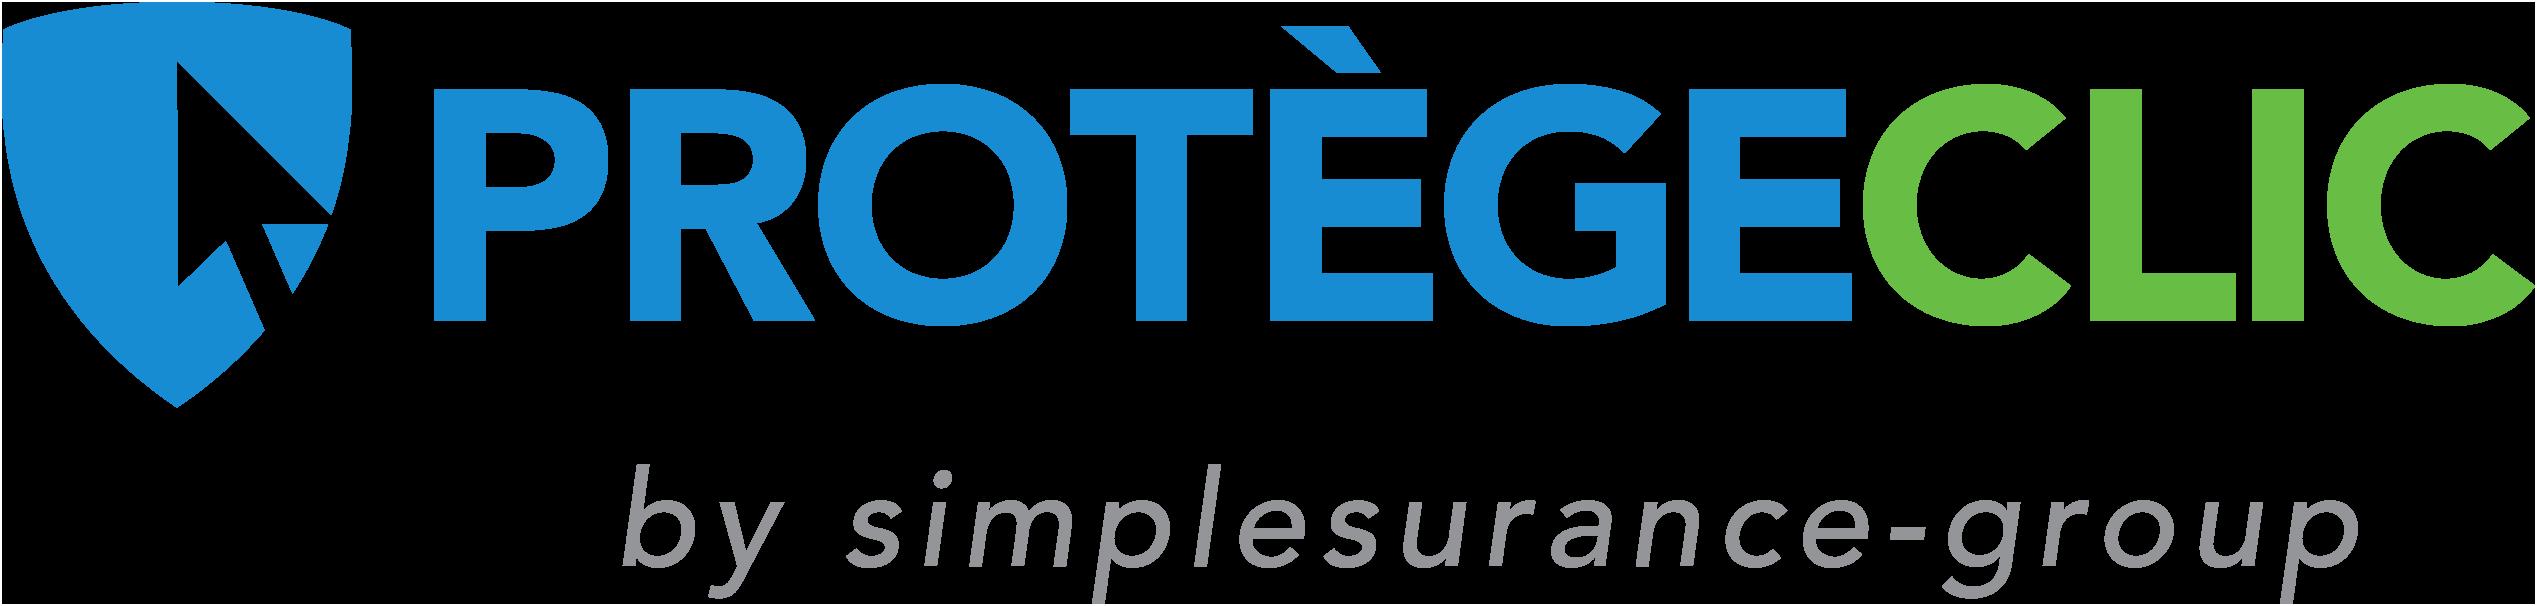 ProtegeClic garantie